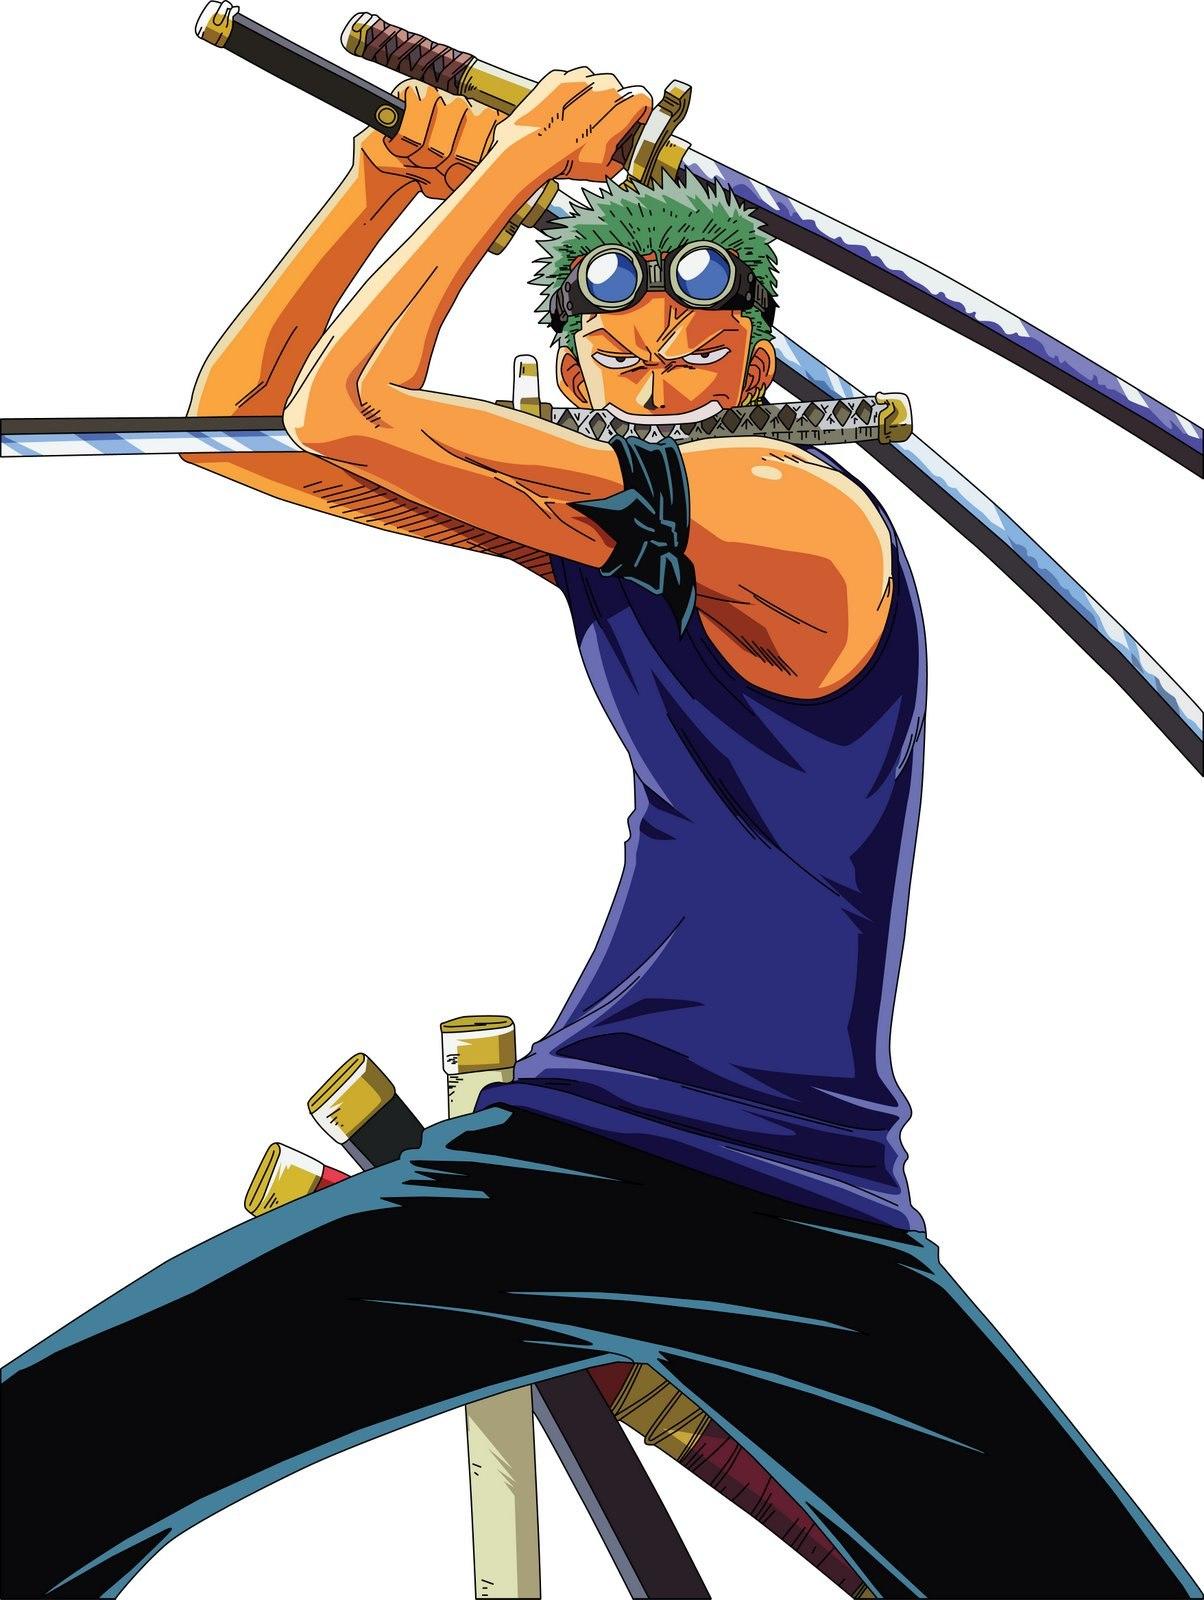 Zoro Wallpapers Zorro One Piece Wallpaper Sanji - One Piece Zoro Skypiea - HD Wallpaper